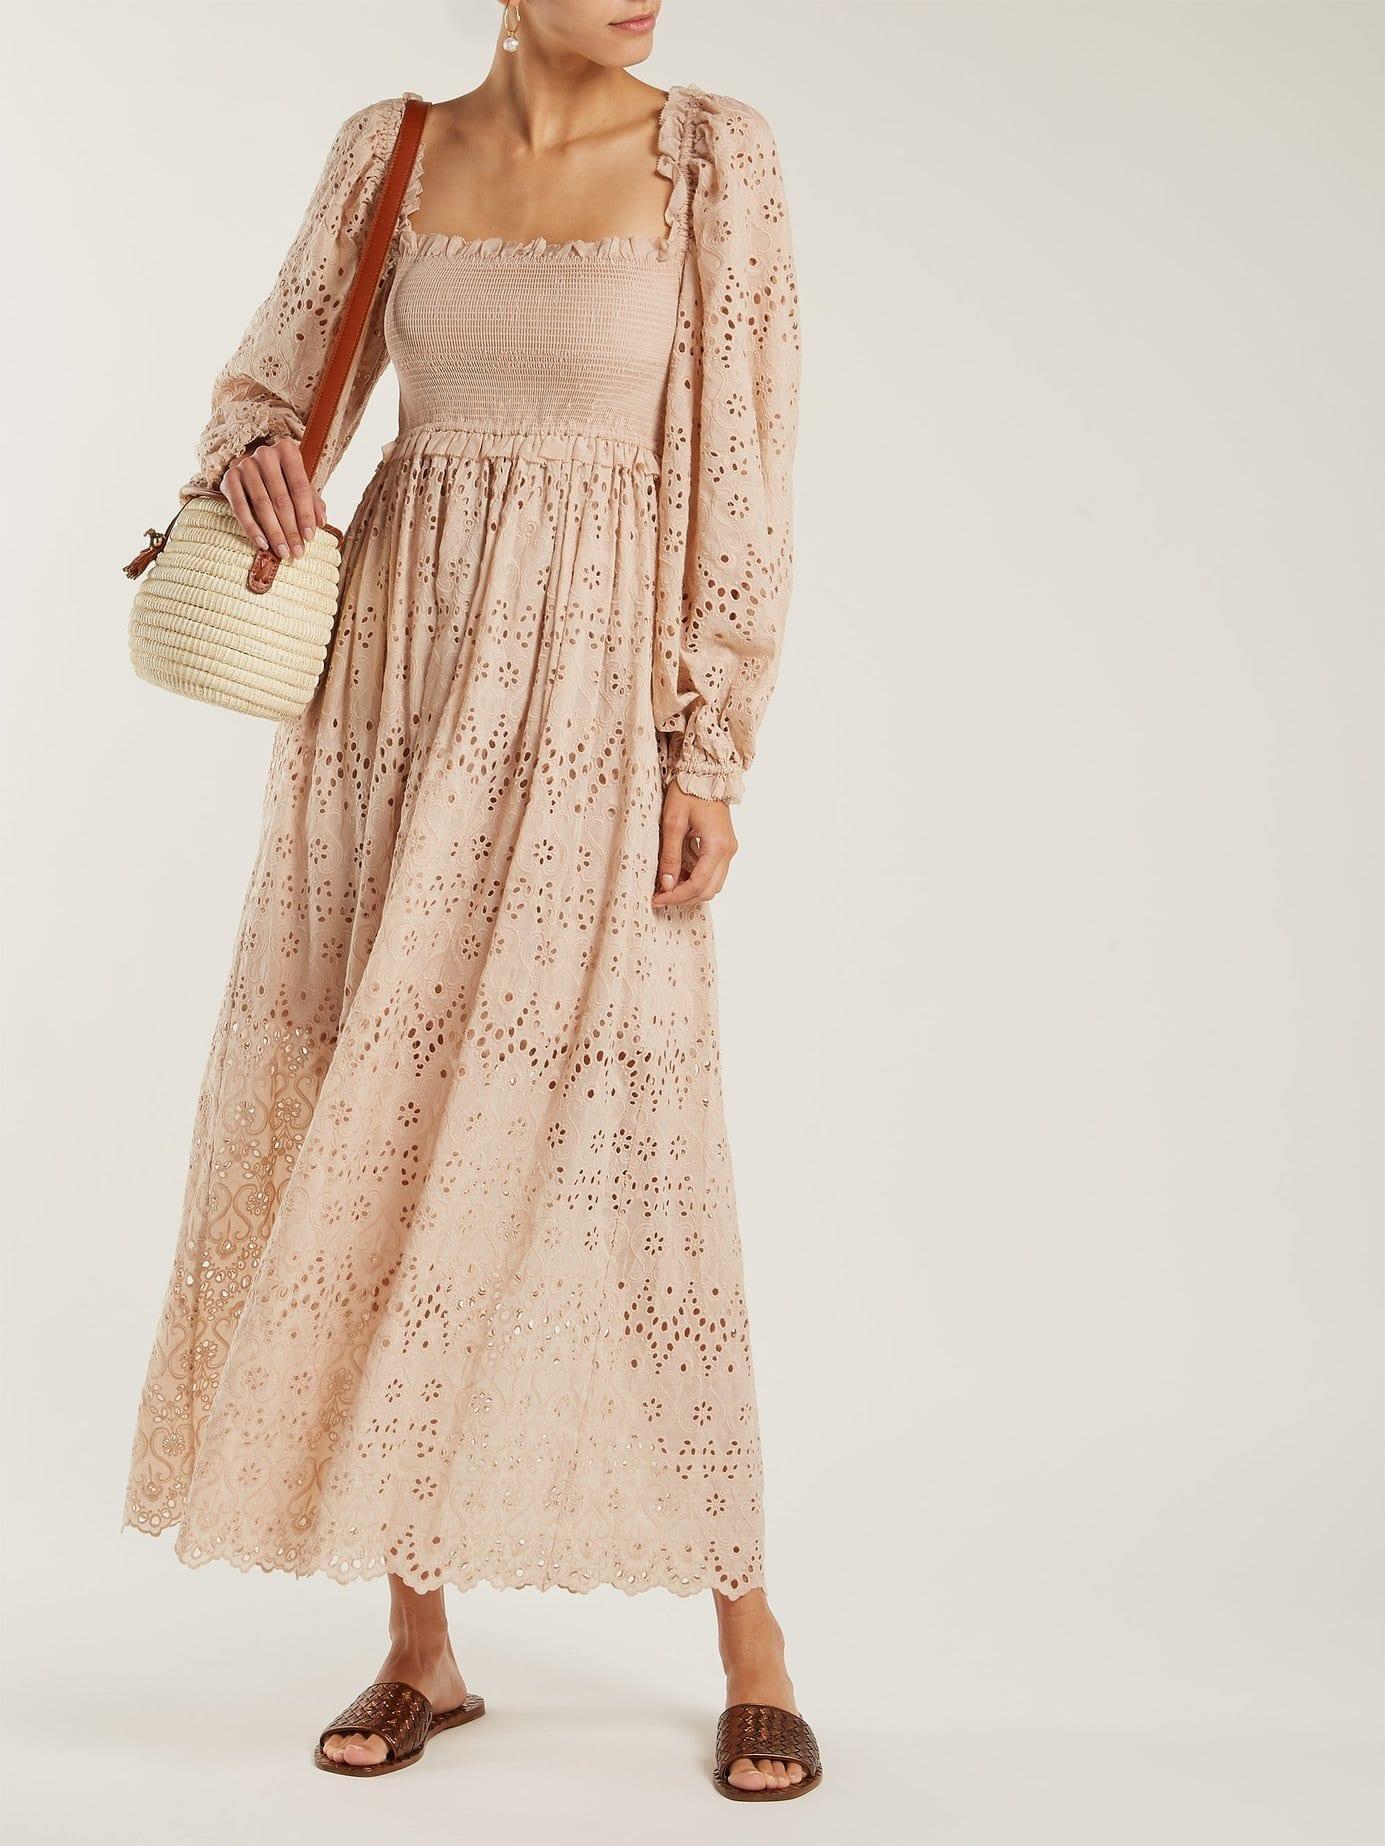 ZIMMERMANN Bayou Blouson Broderie Anglaise Cotton Blend Beige Dress